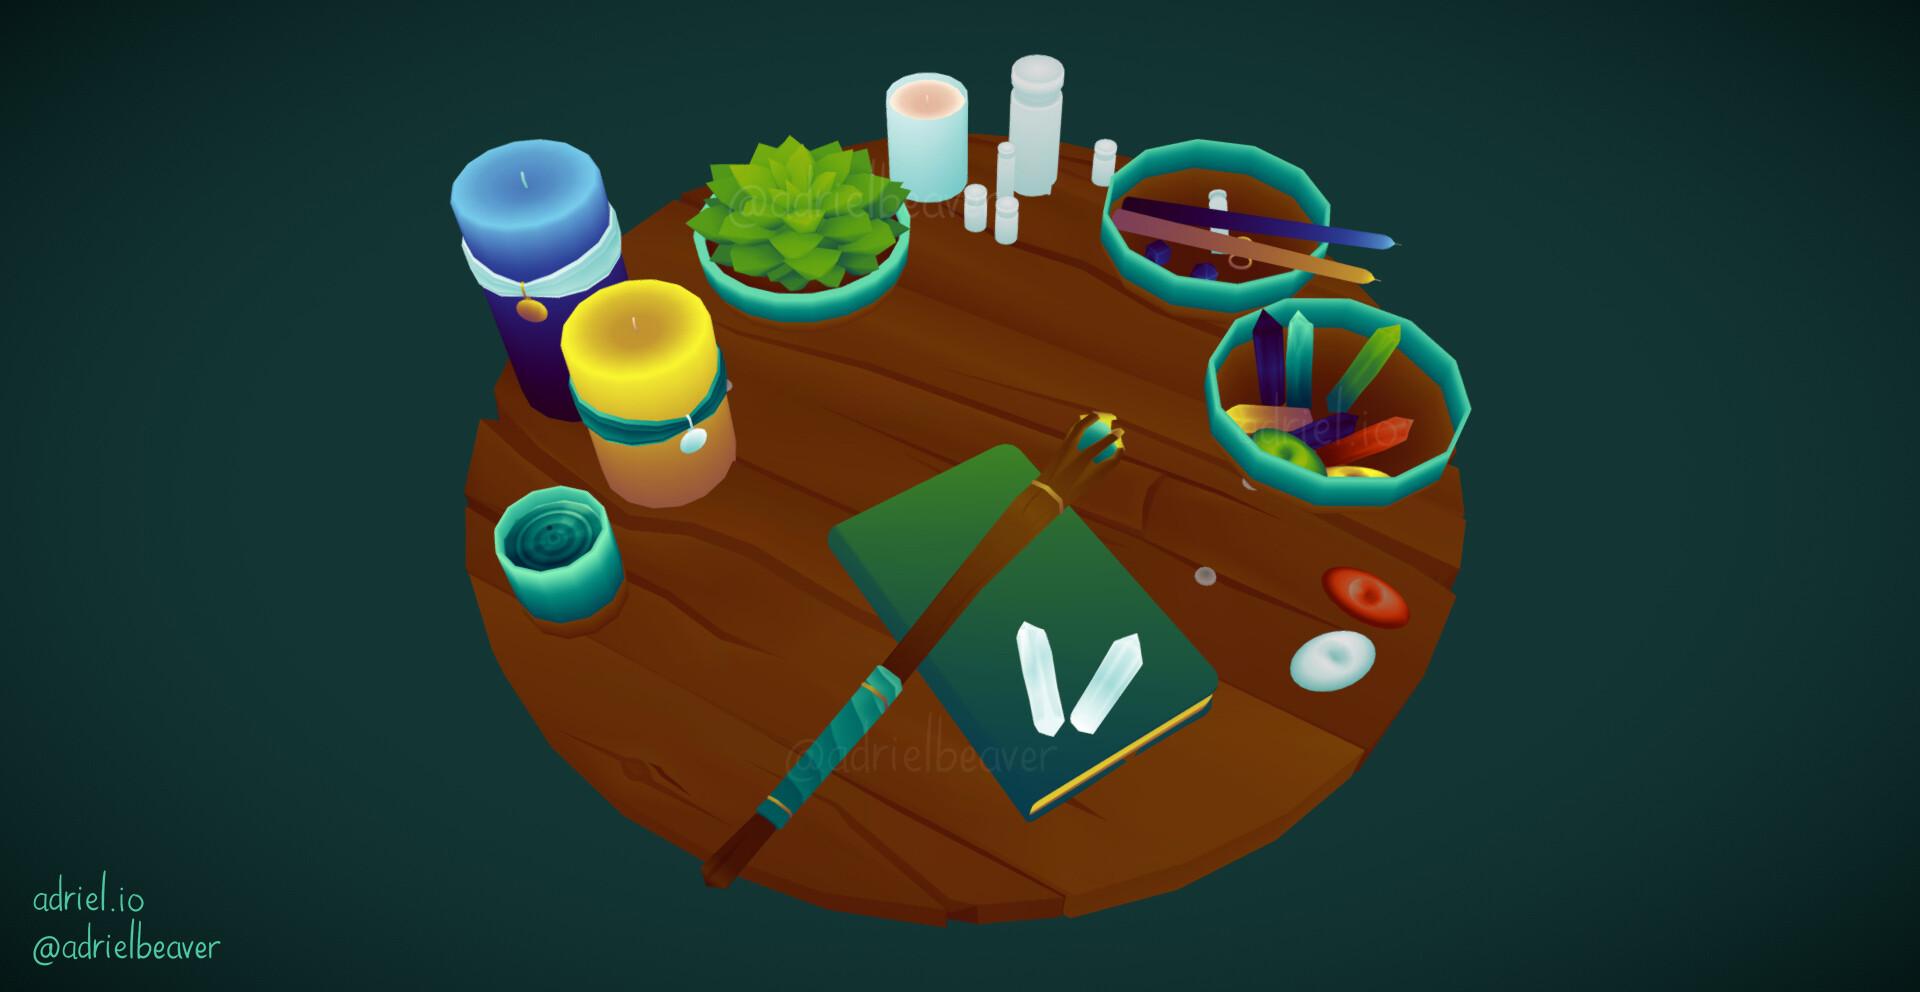 Adriel beaver witch altar